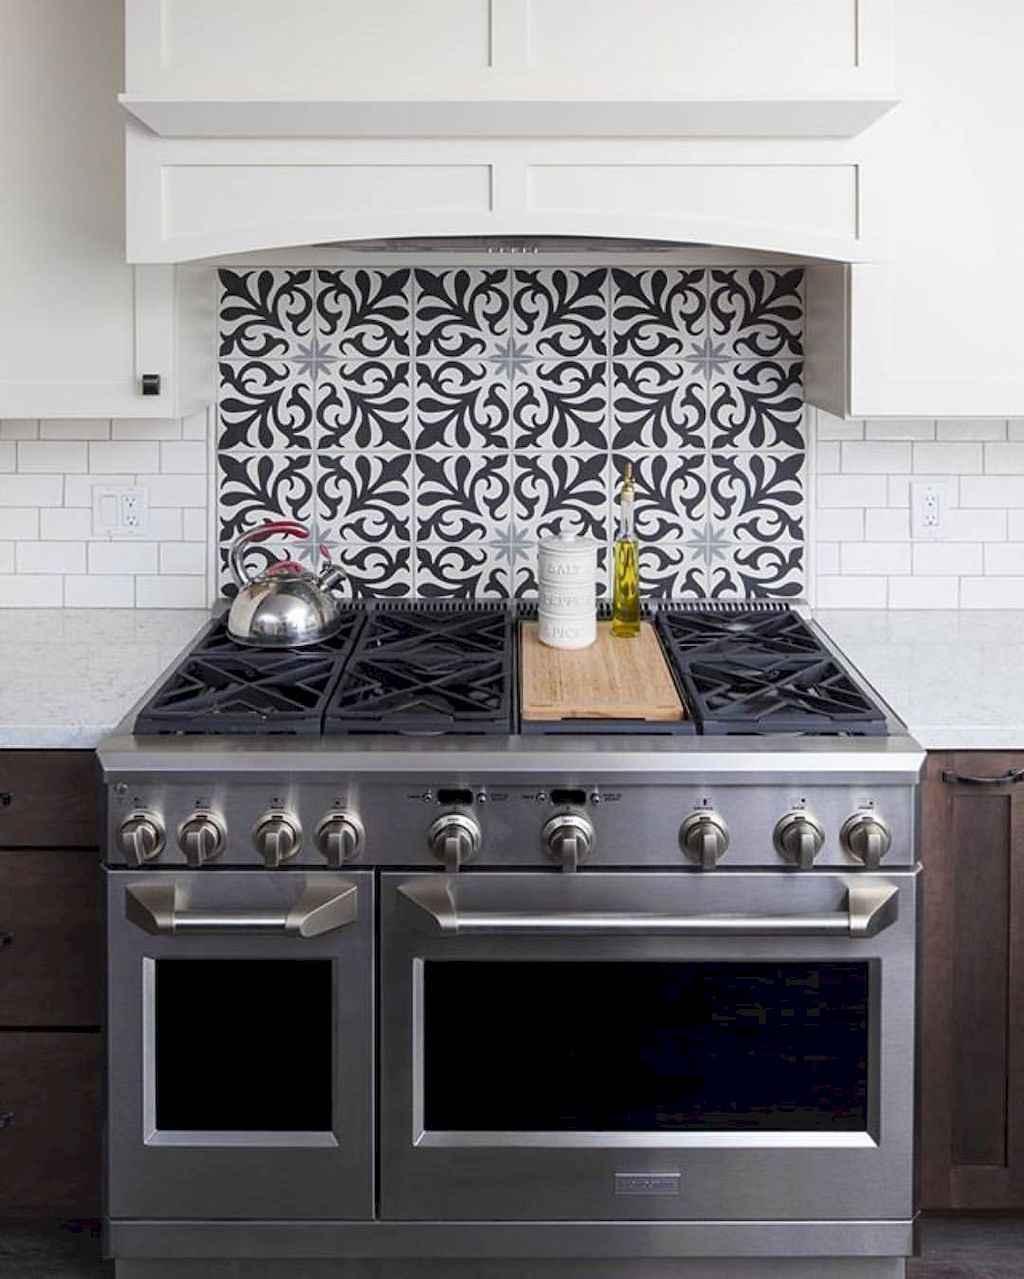 10 Beach Backsplash Ideas: 40 Stunning Kitchen Backsplash Decorating Ideas